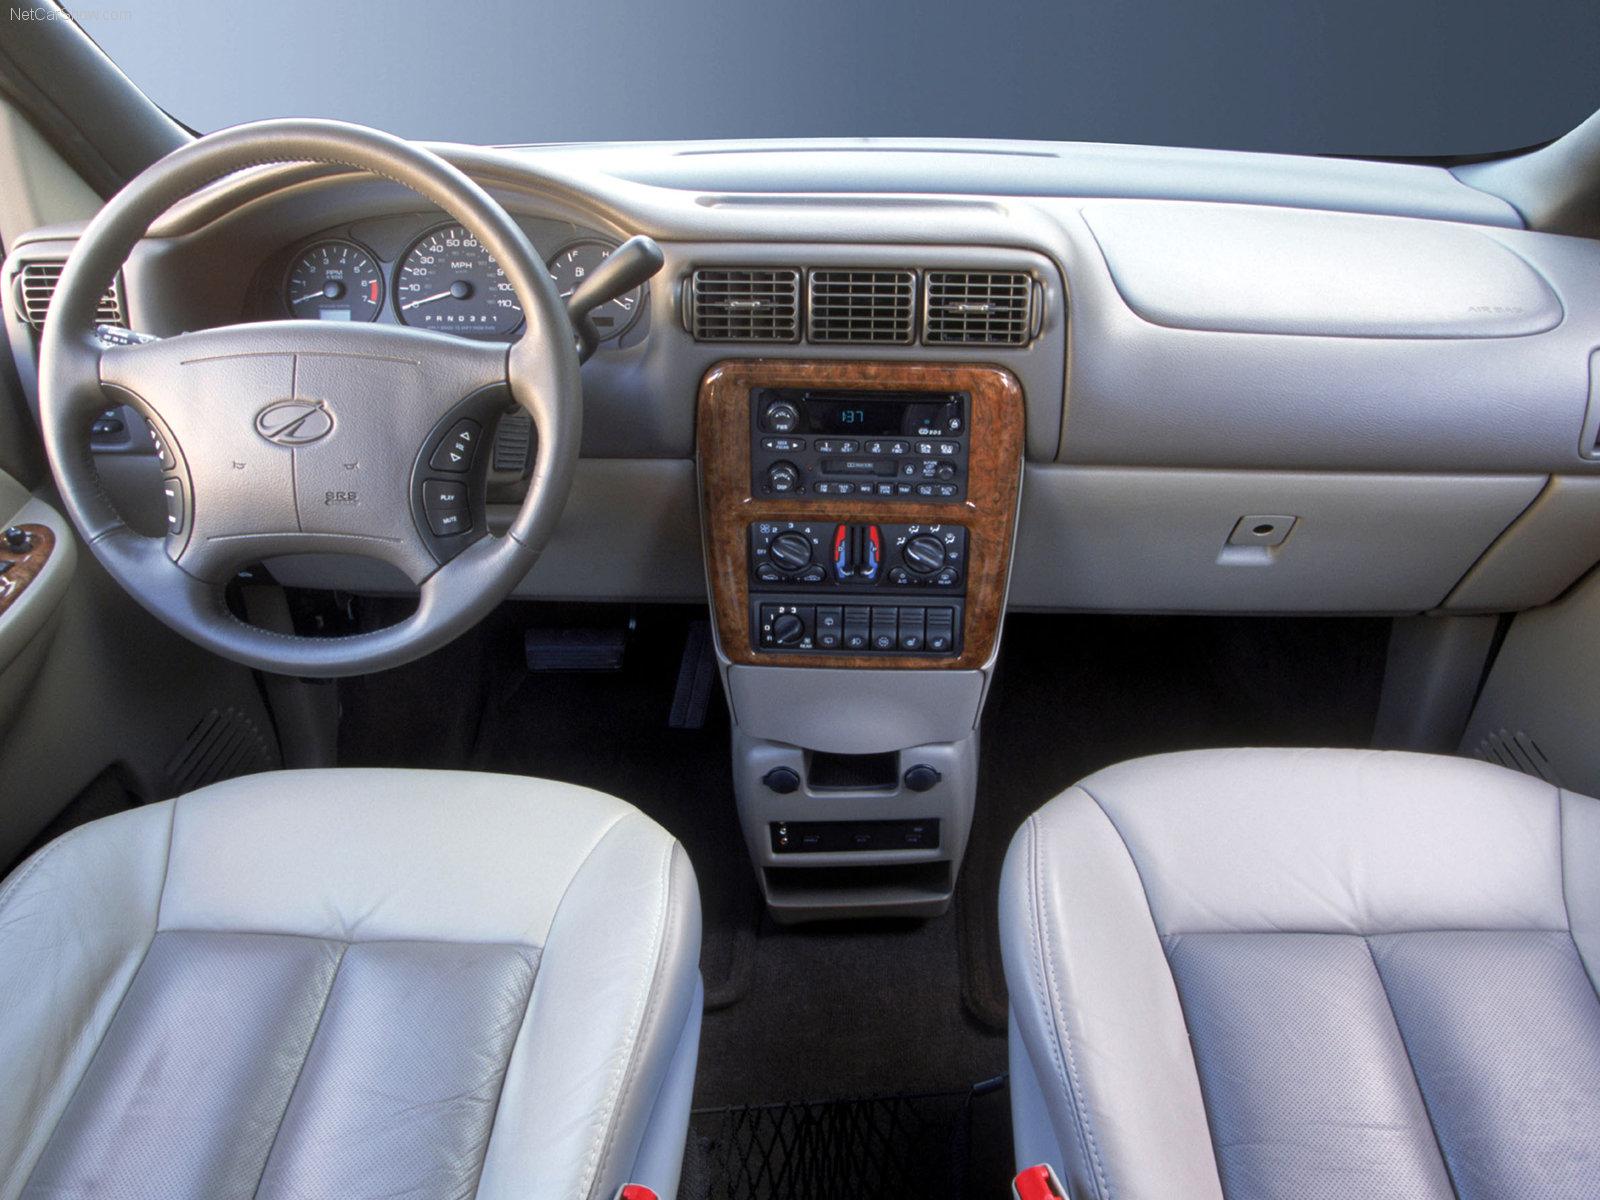 2005 Oldsmobile Alero Interior 1998 Aurora Fuse Diagram 2004 Sedan Outstanding Cars